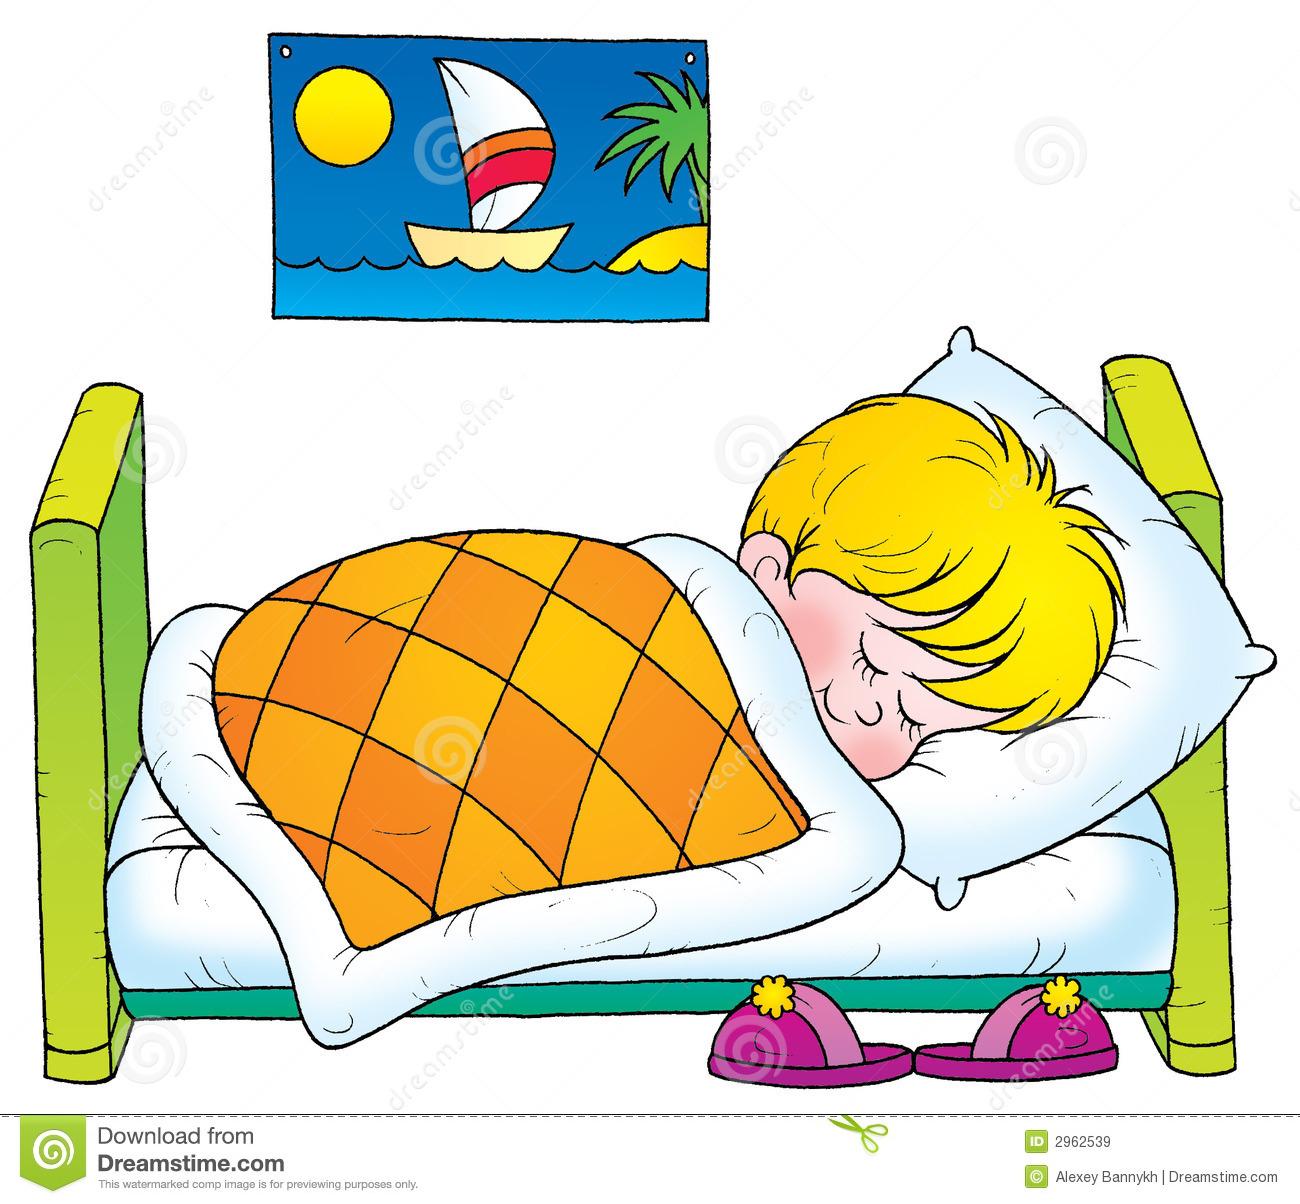 Children Sleeping Clipart.